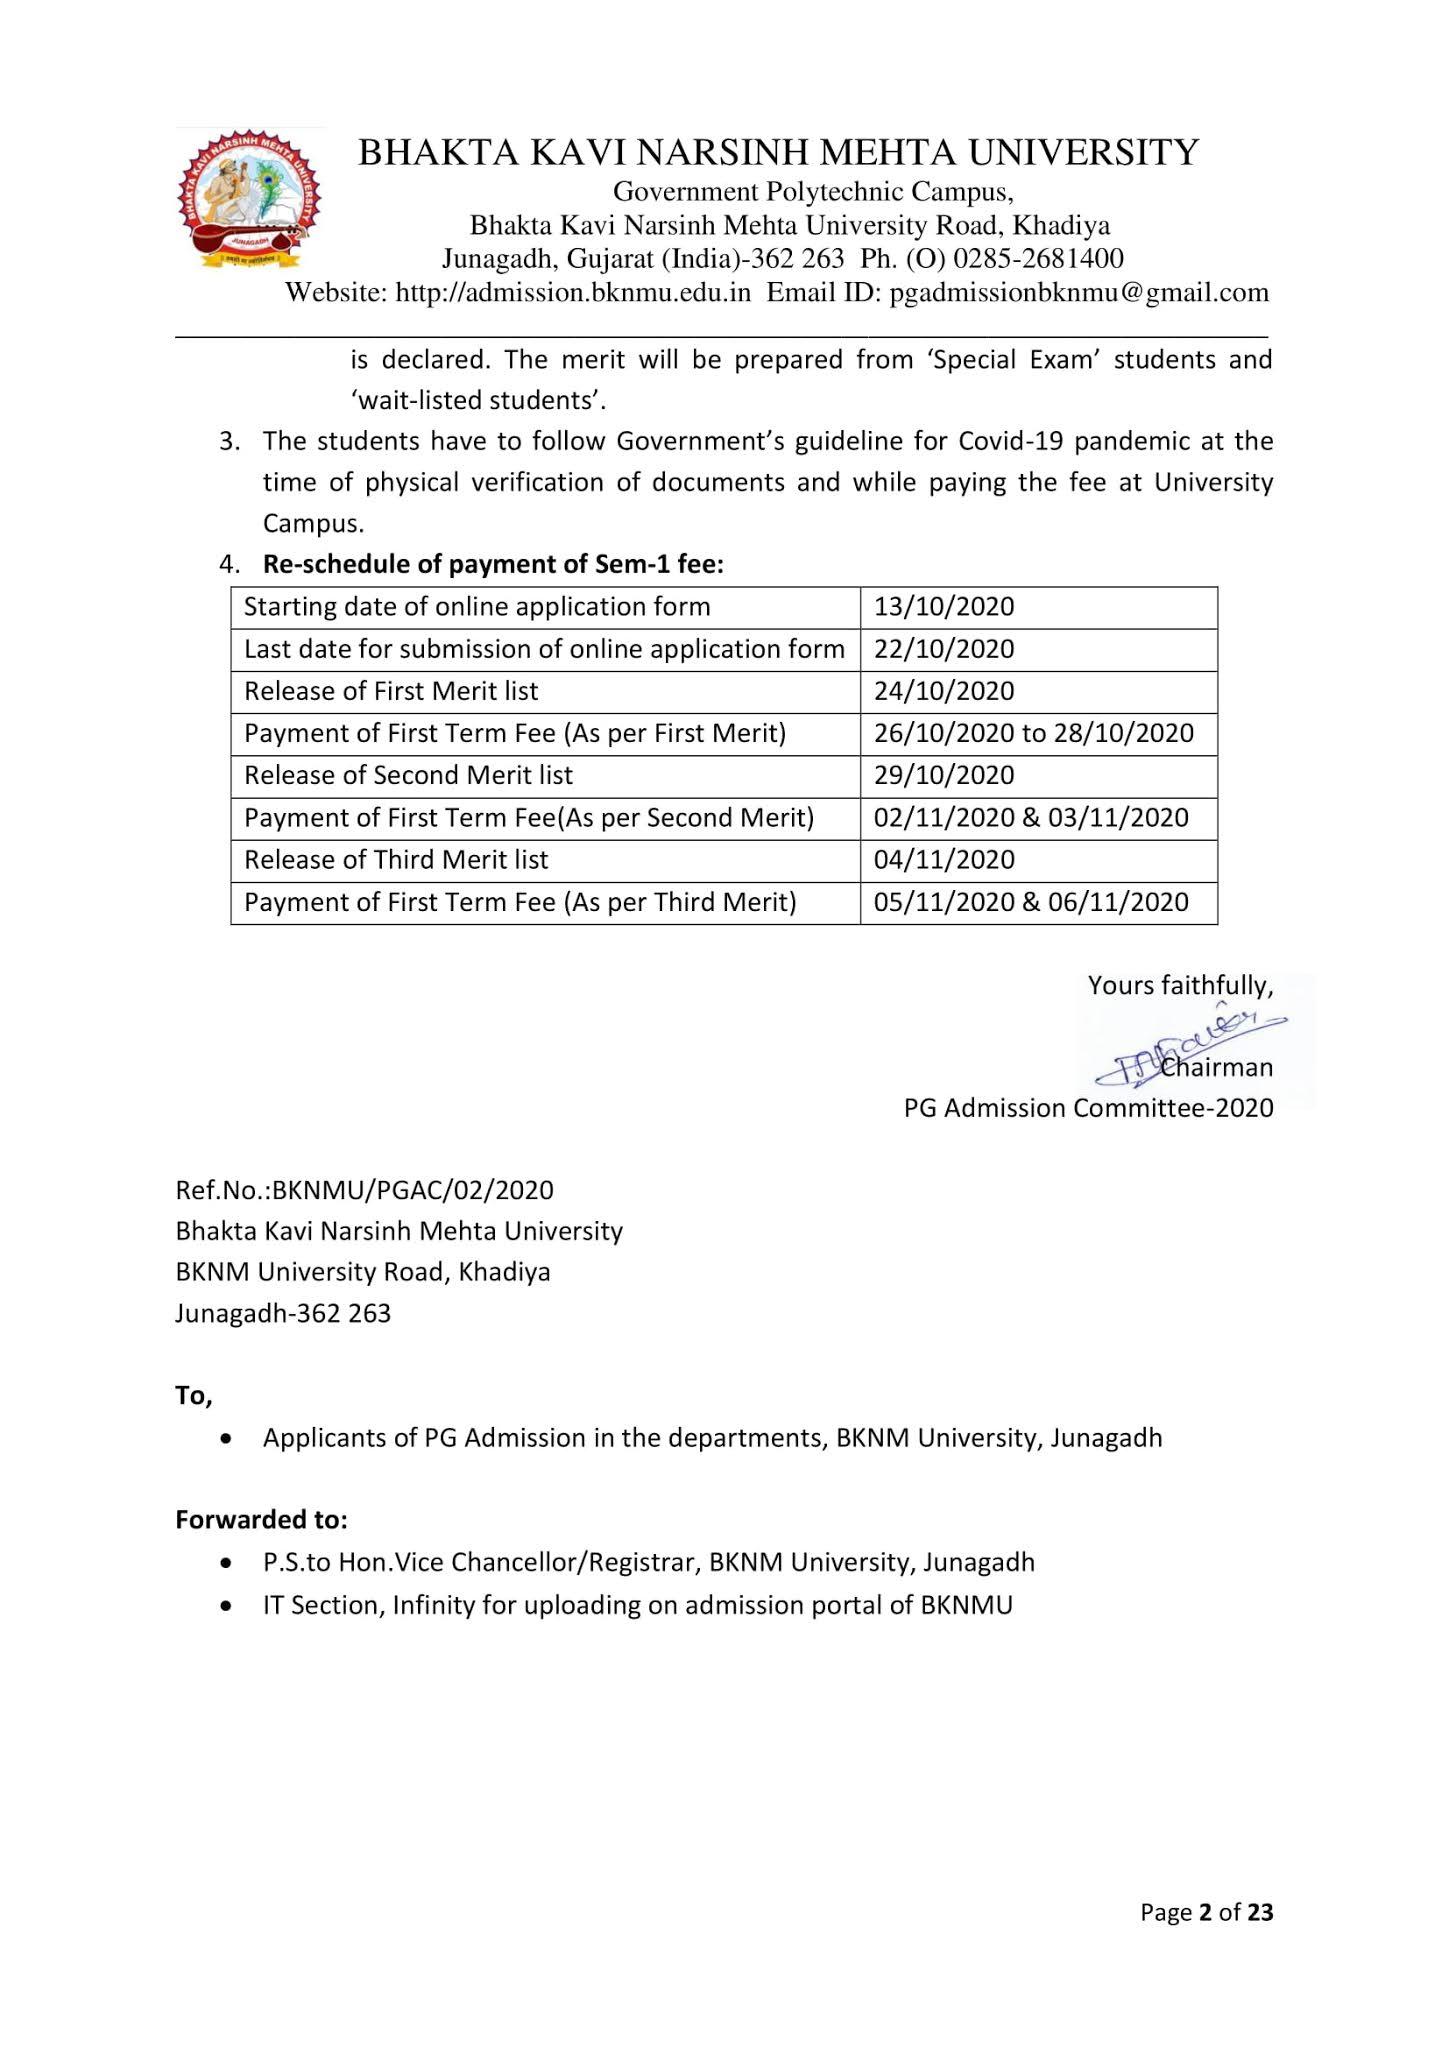 Bknmu Ma Msc Mcom Provisional Merit List 24 10 2020 Bhakta Kavi Narsinh Mehta University Admissions 2020 2021 Mr Kawant